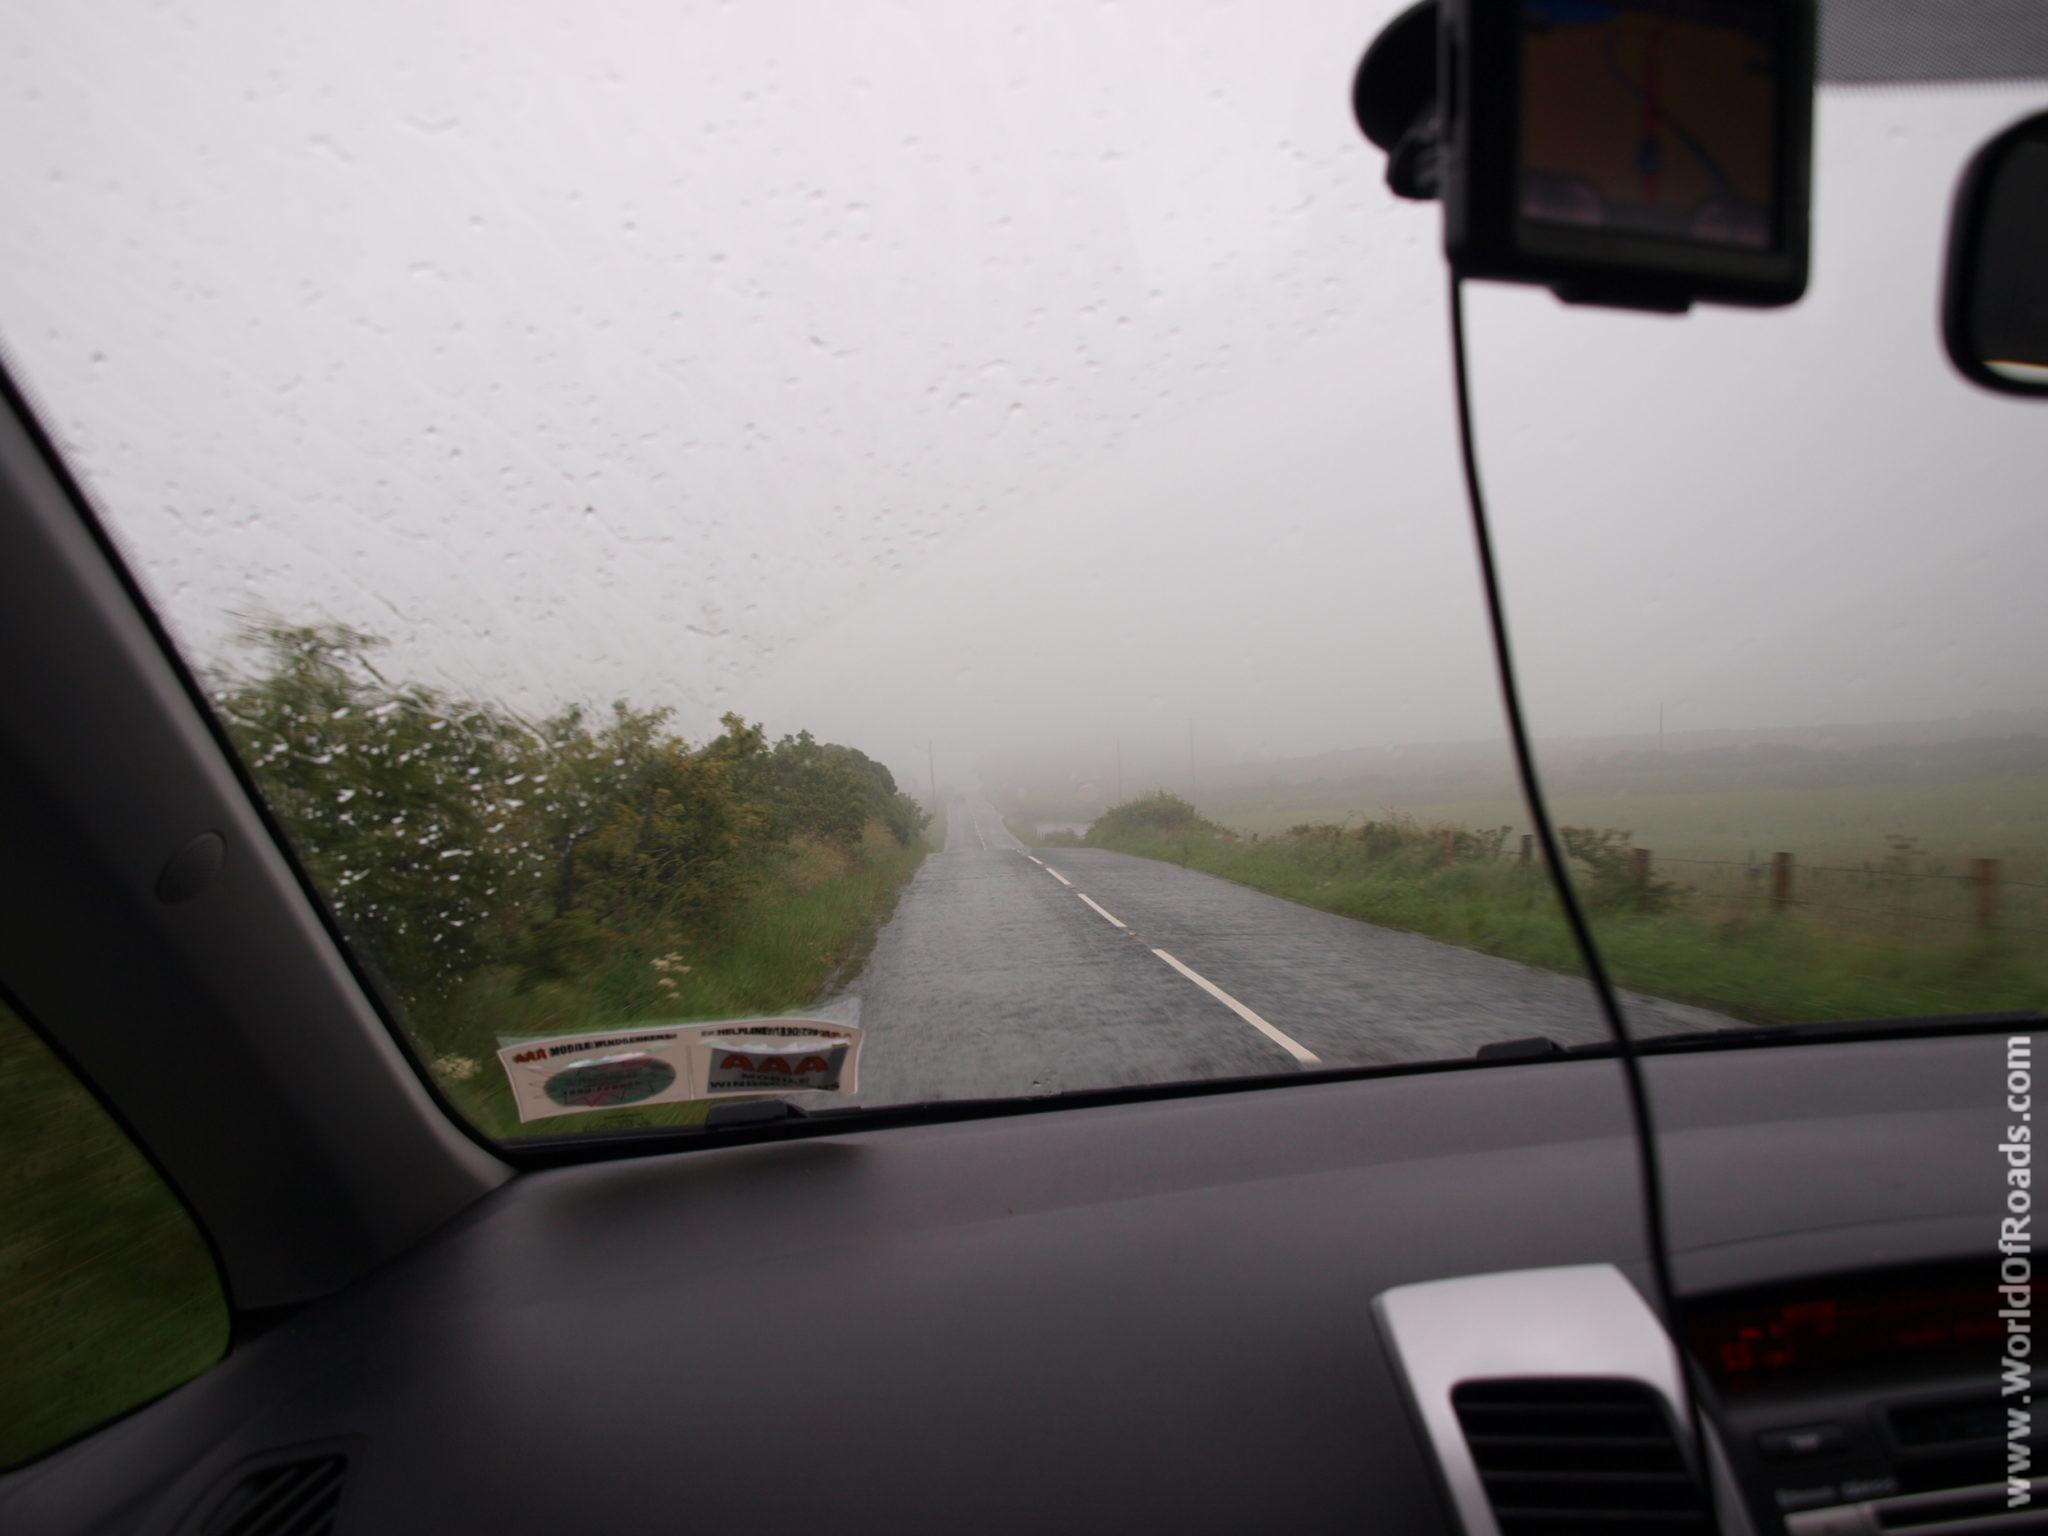 Дорога. Туман. Северная Ирландия.